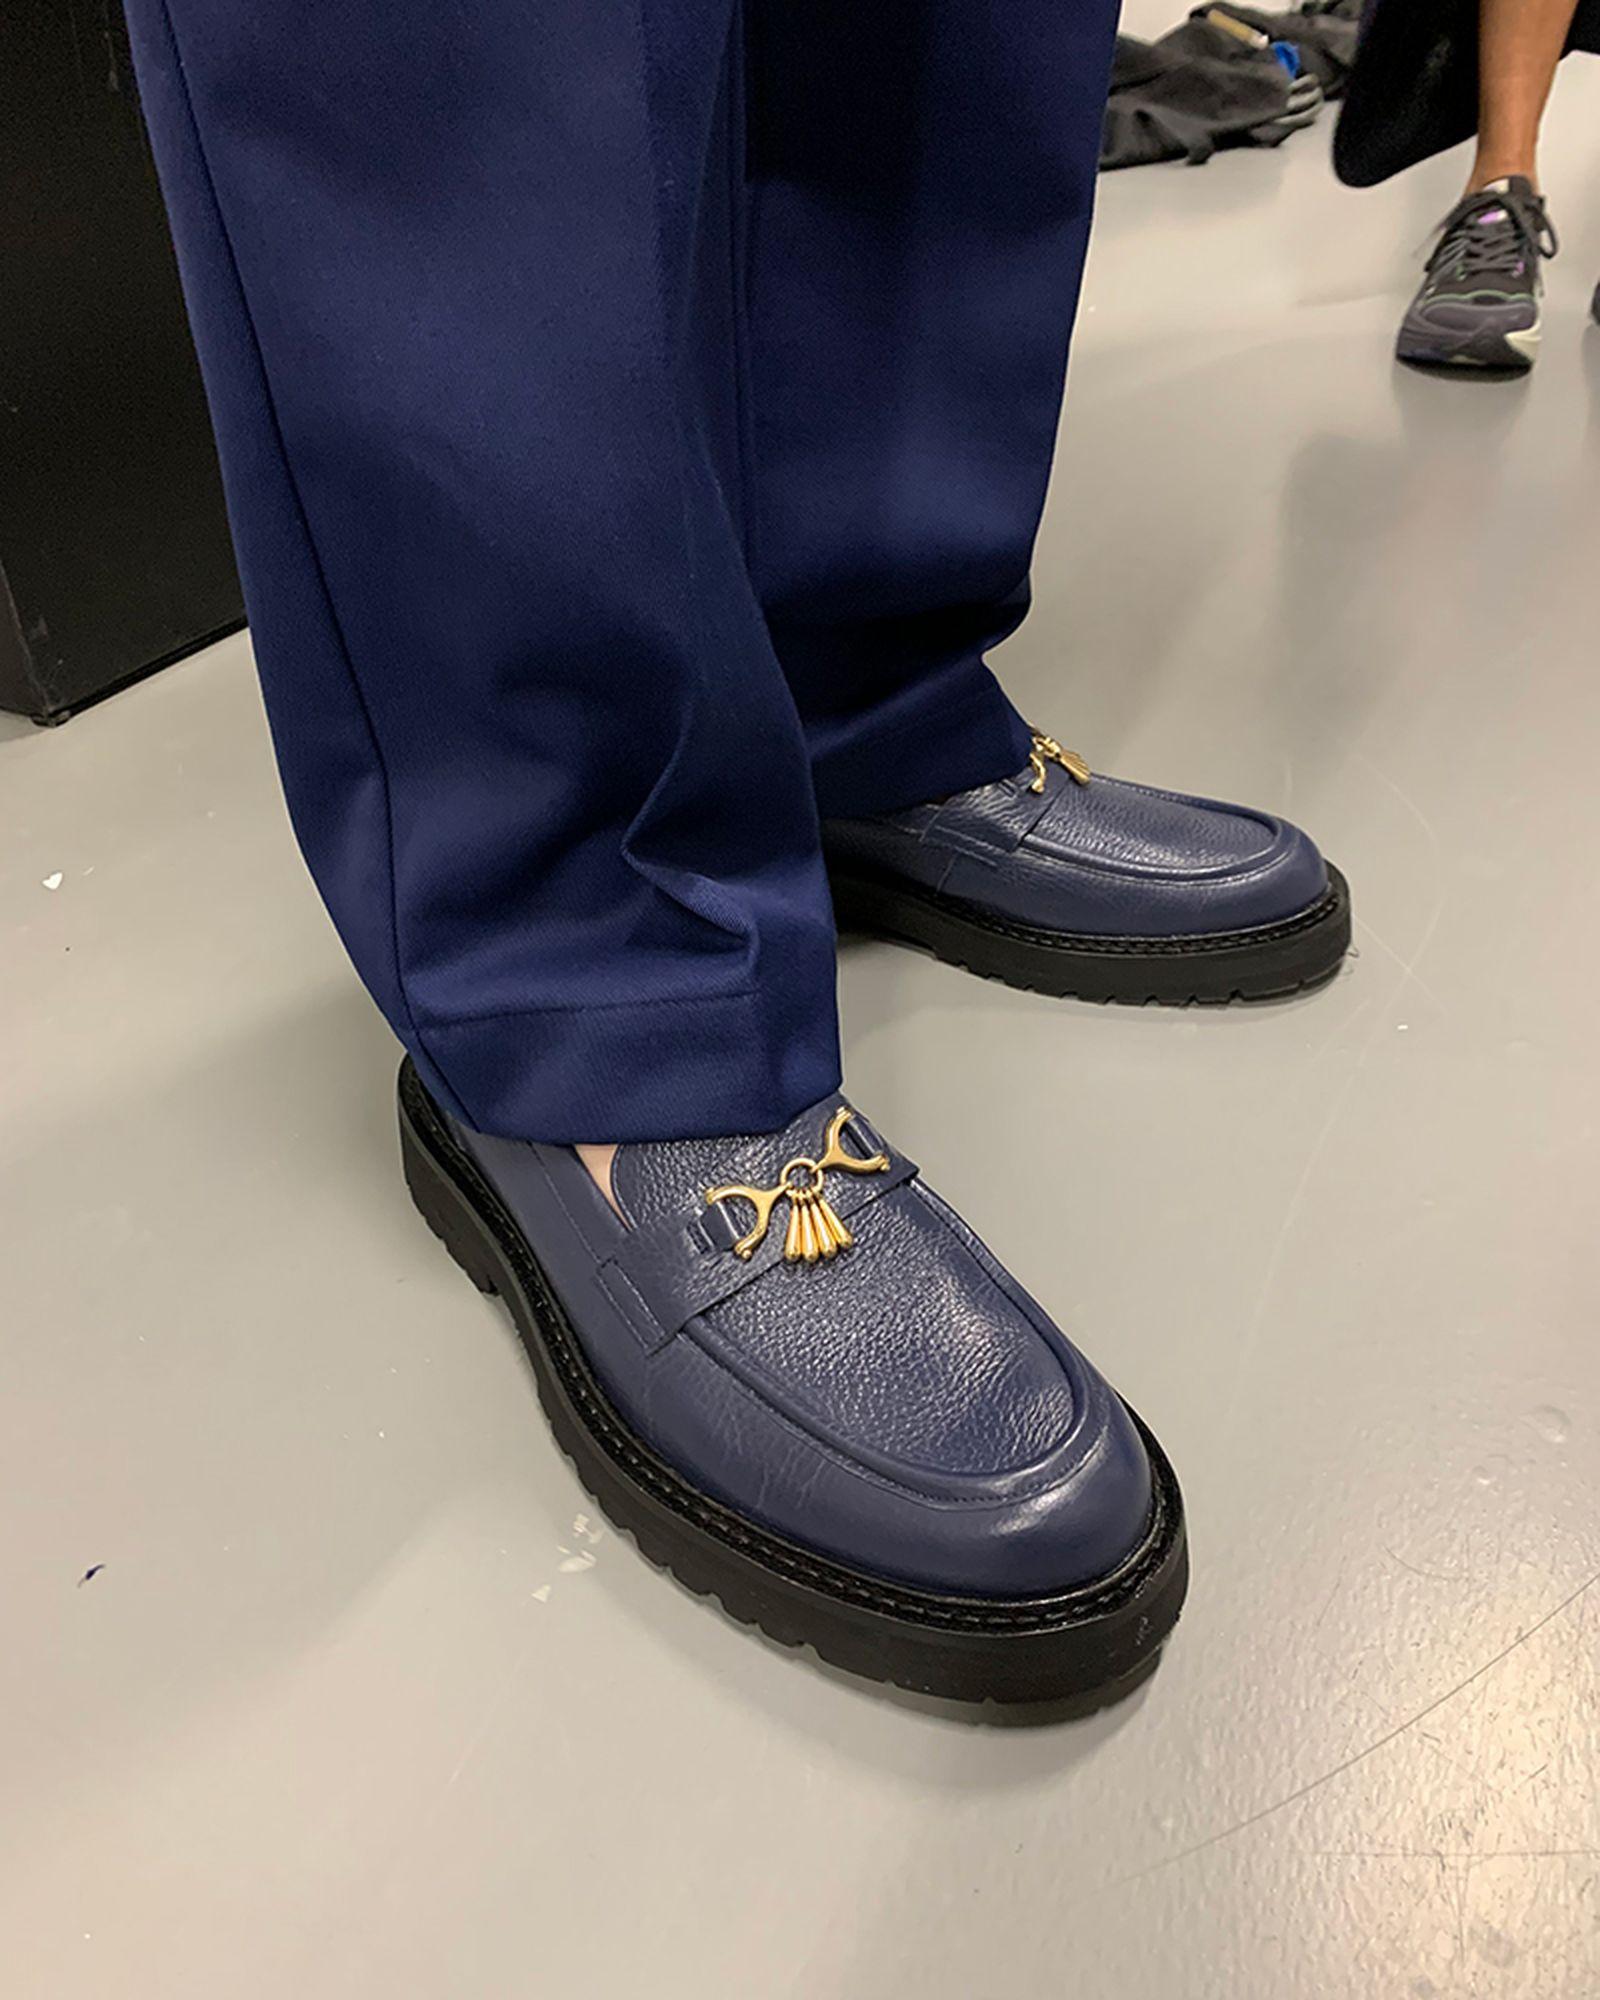 li-ning-soulland-sneakers-03